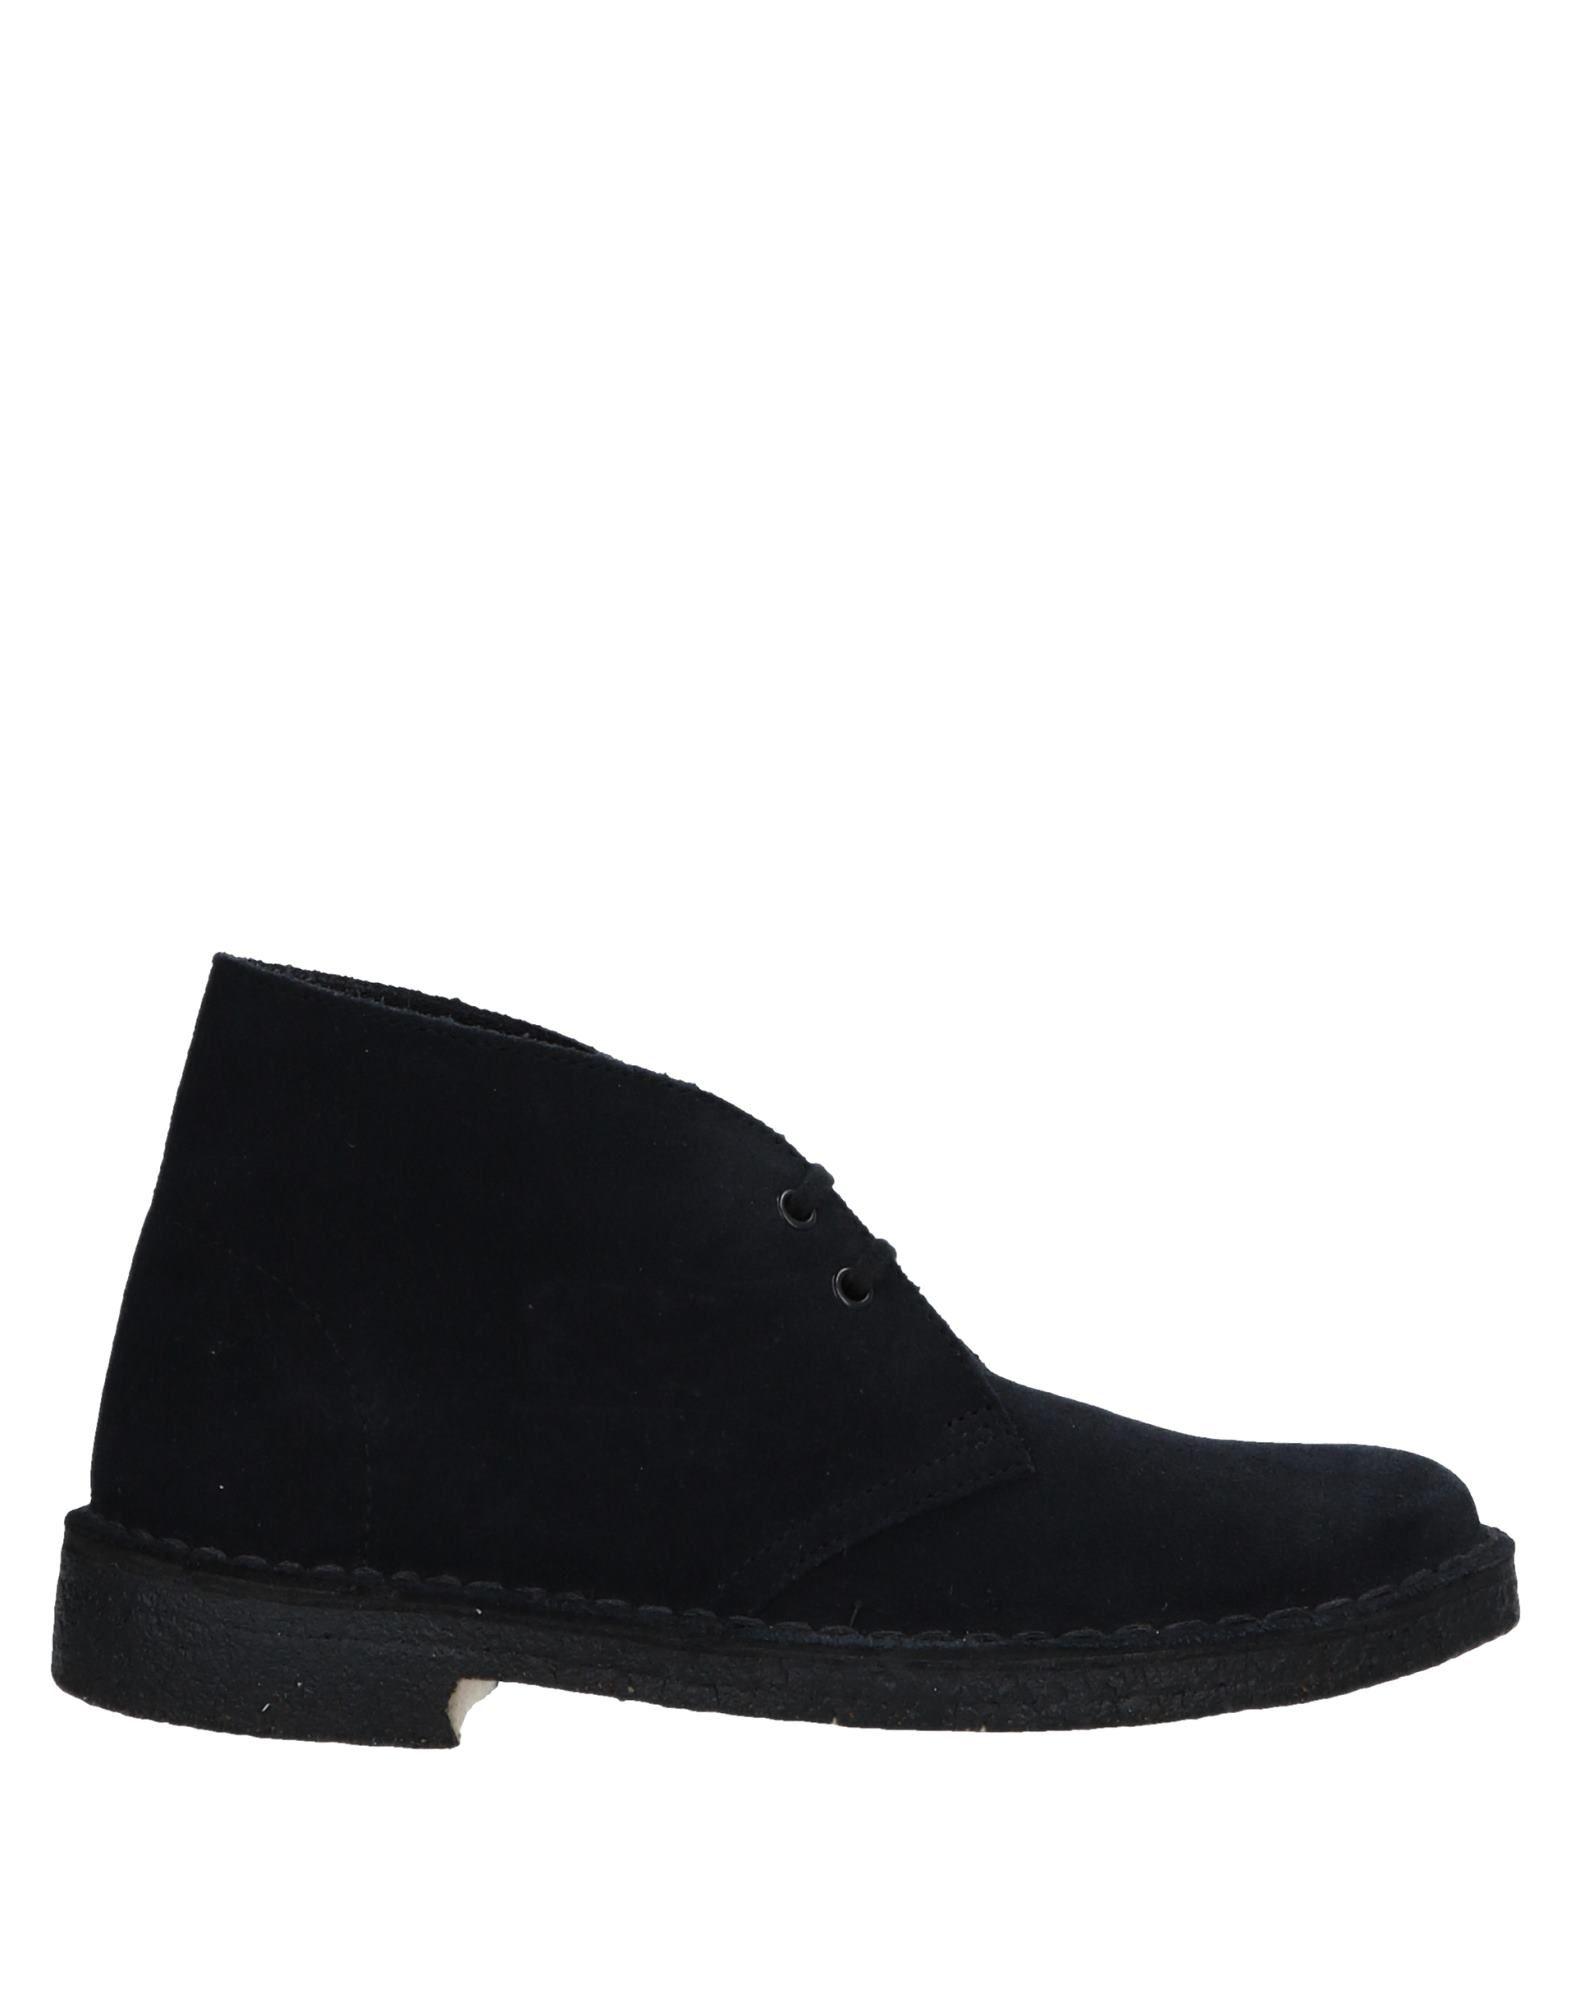 Clarks Originals Ankle Boot - Women Clarks on Originals Ankle Boots online on Clarks  United Kingdom - 11521737KV 4fc34f